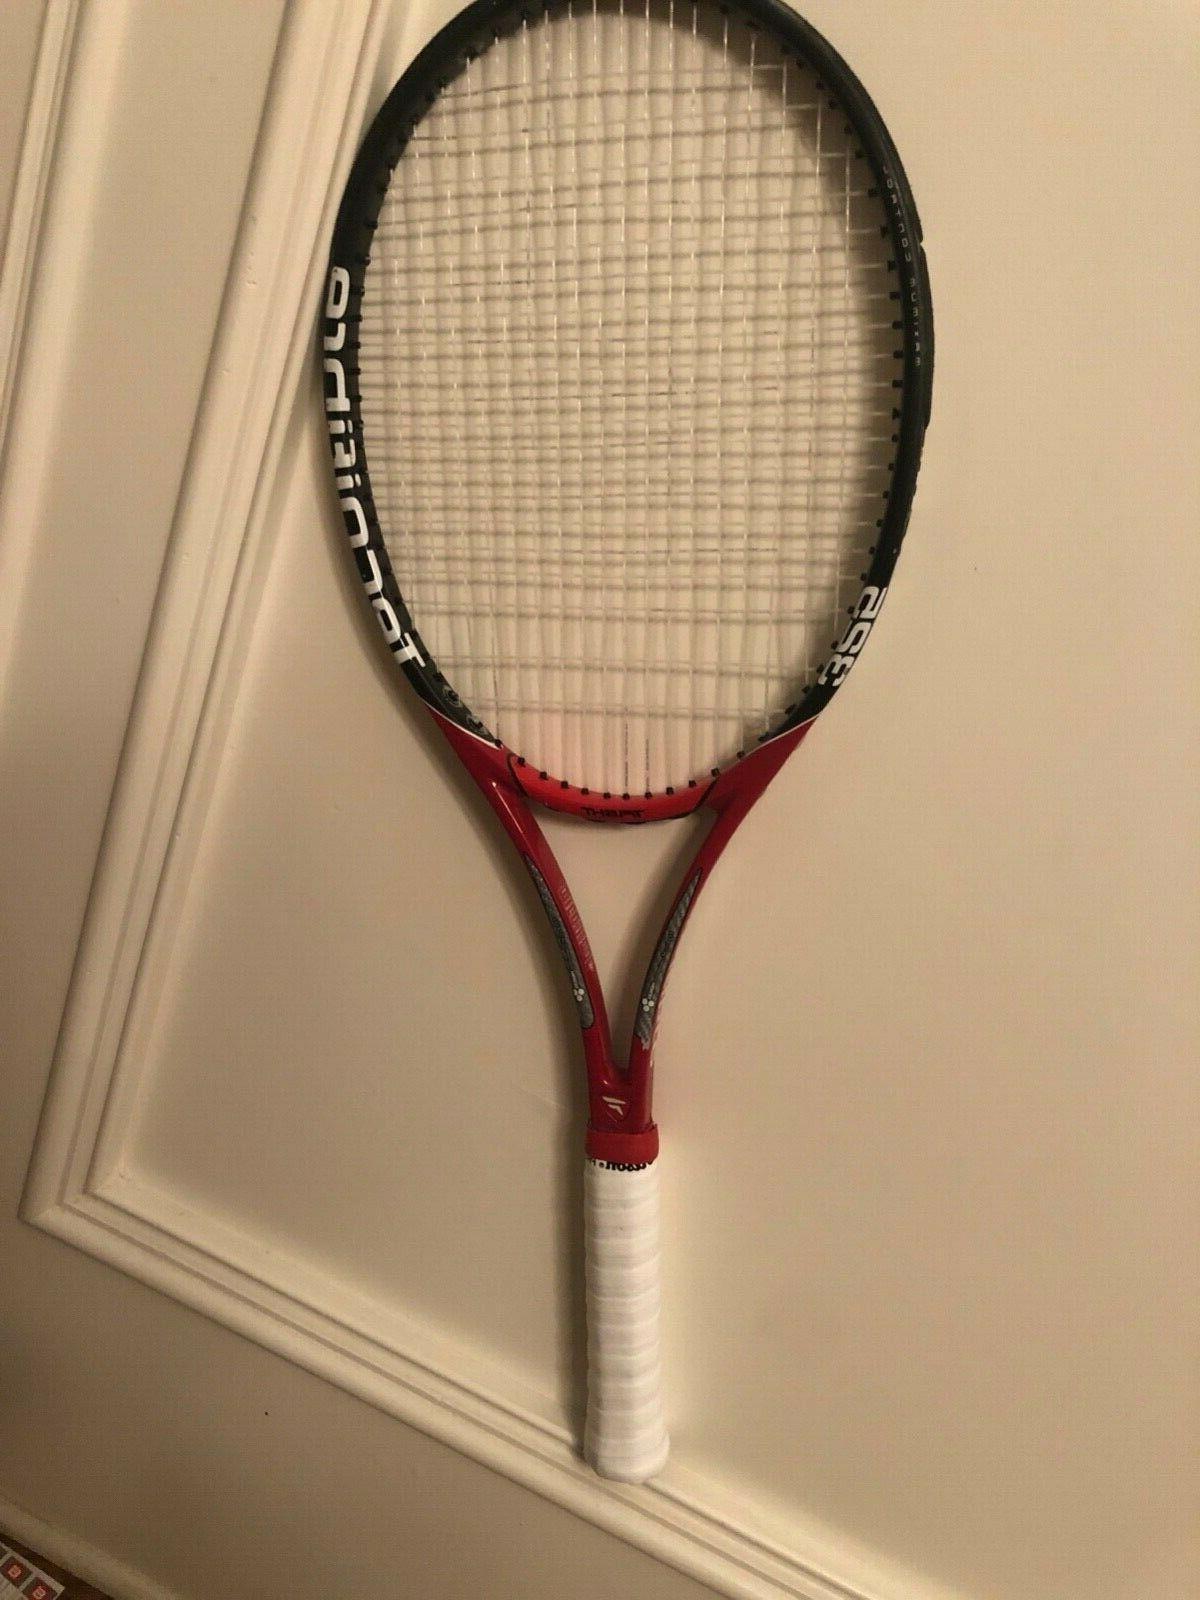 tecnofibre 325 tennis racket